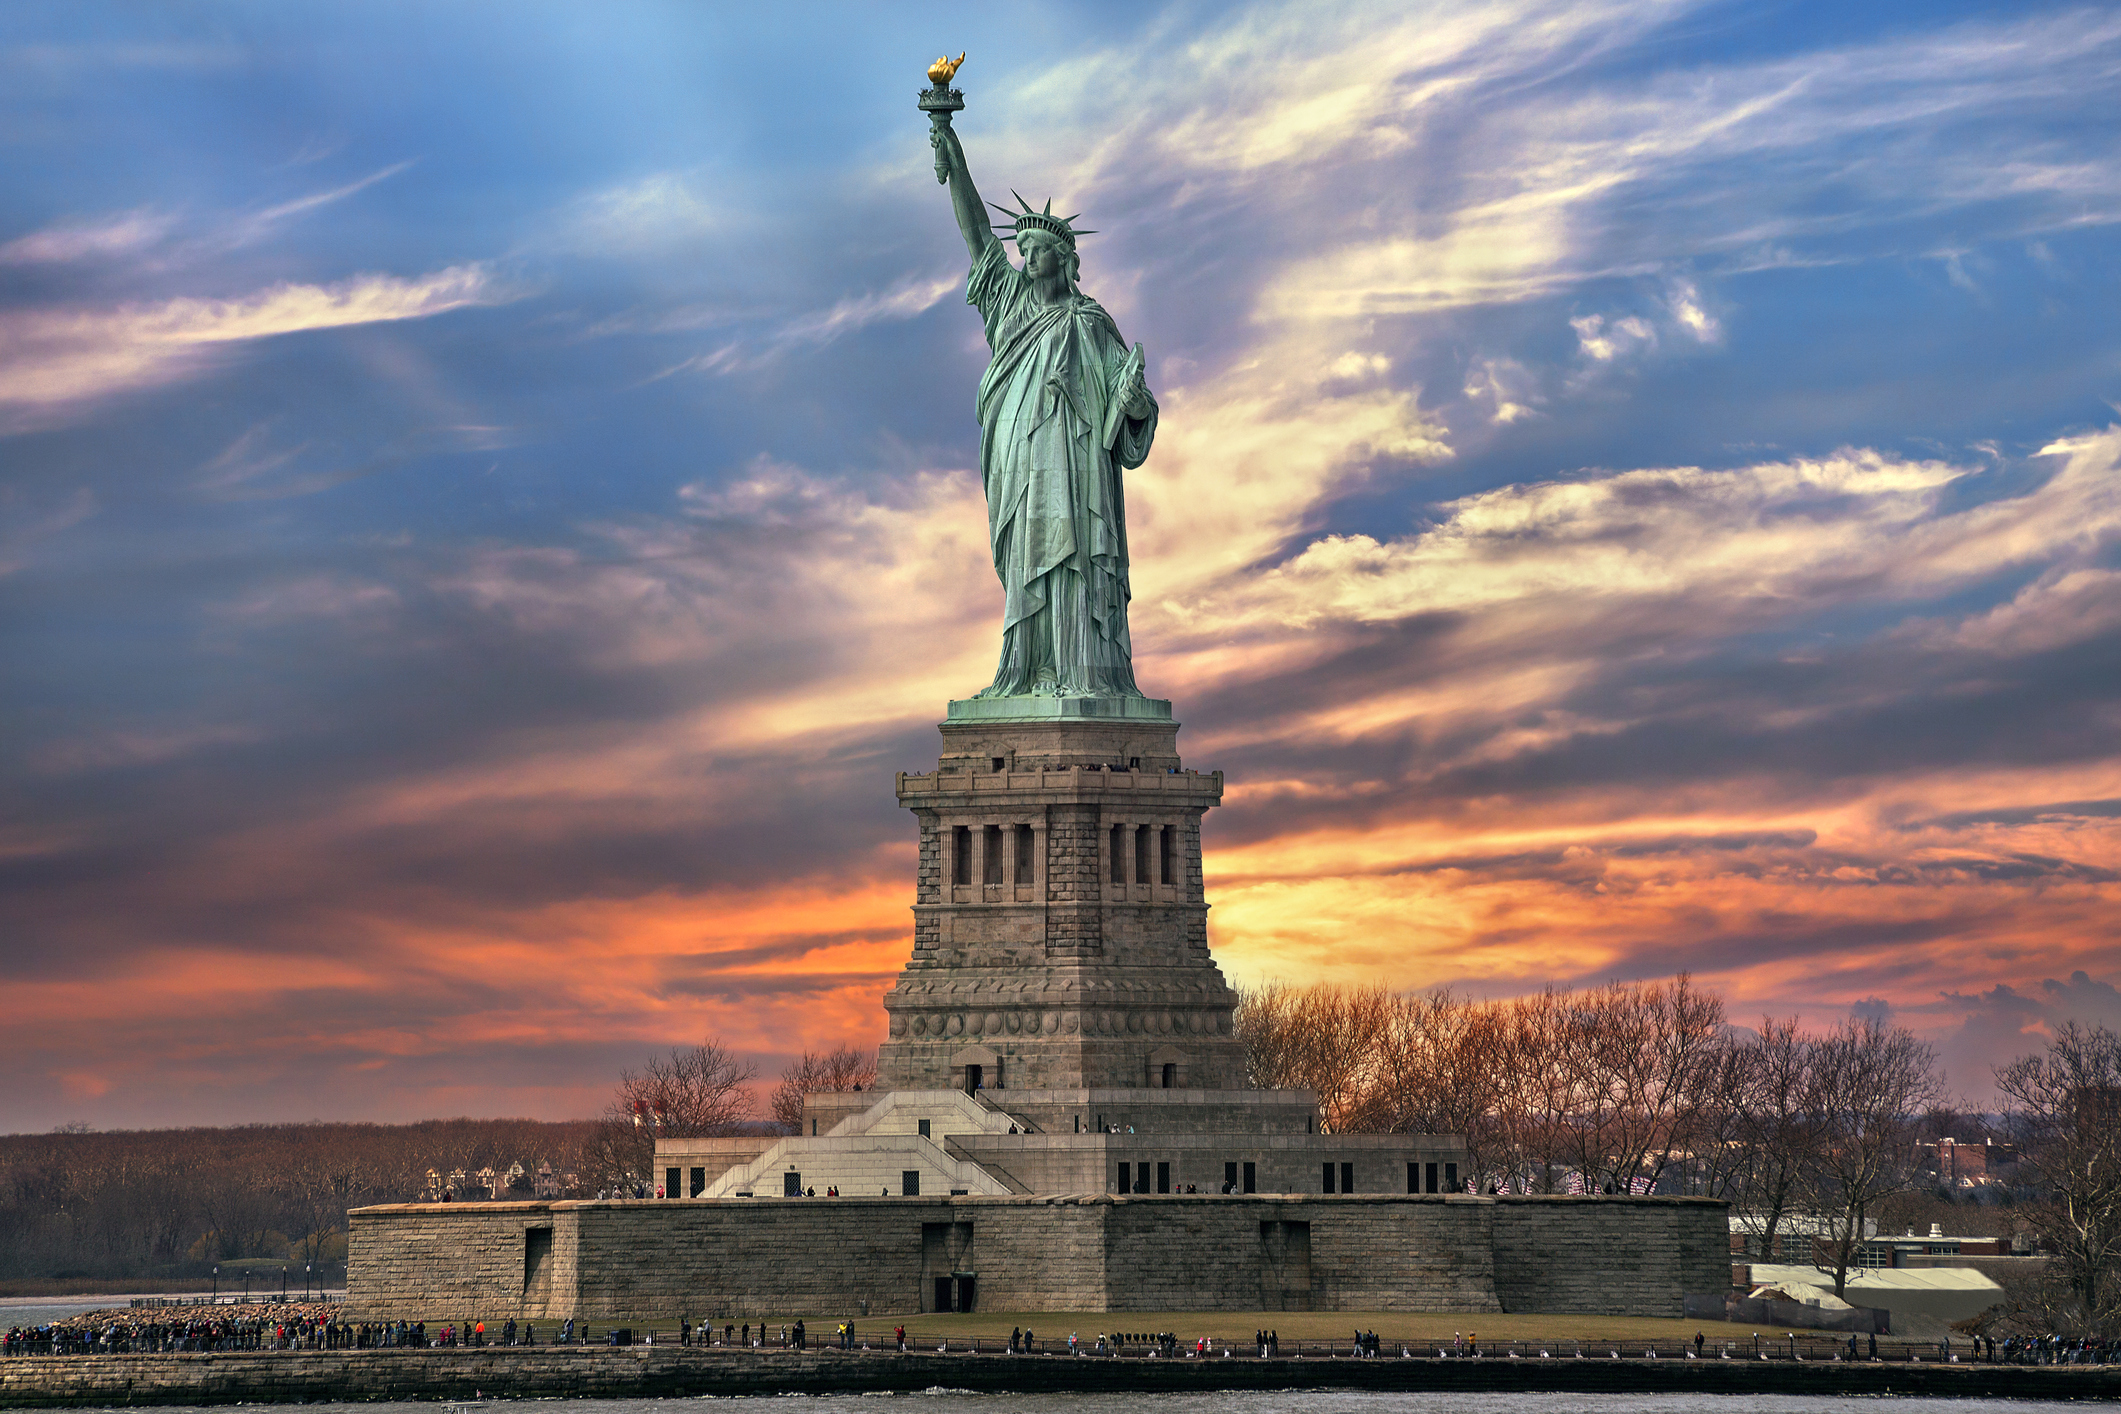 The Statue of Liberty, NYC, USA